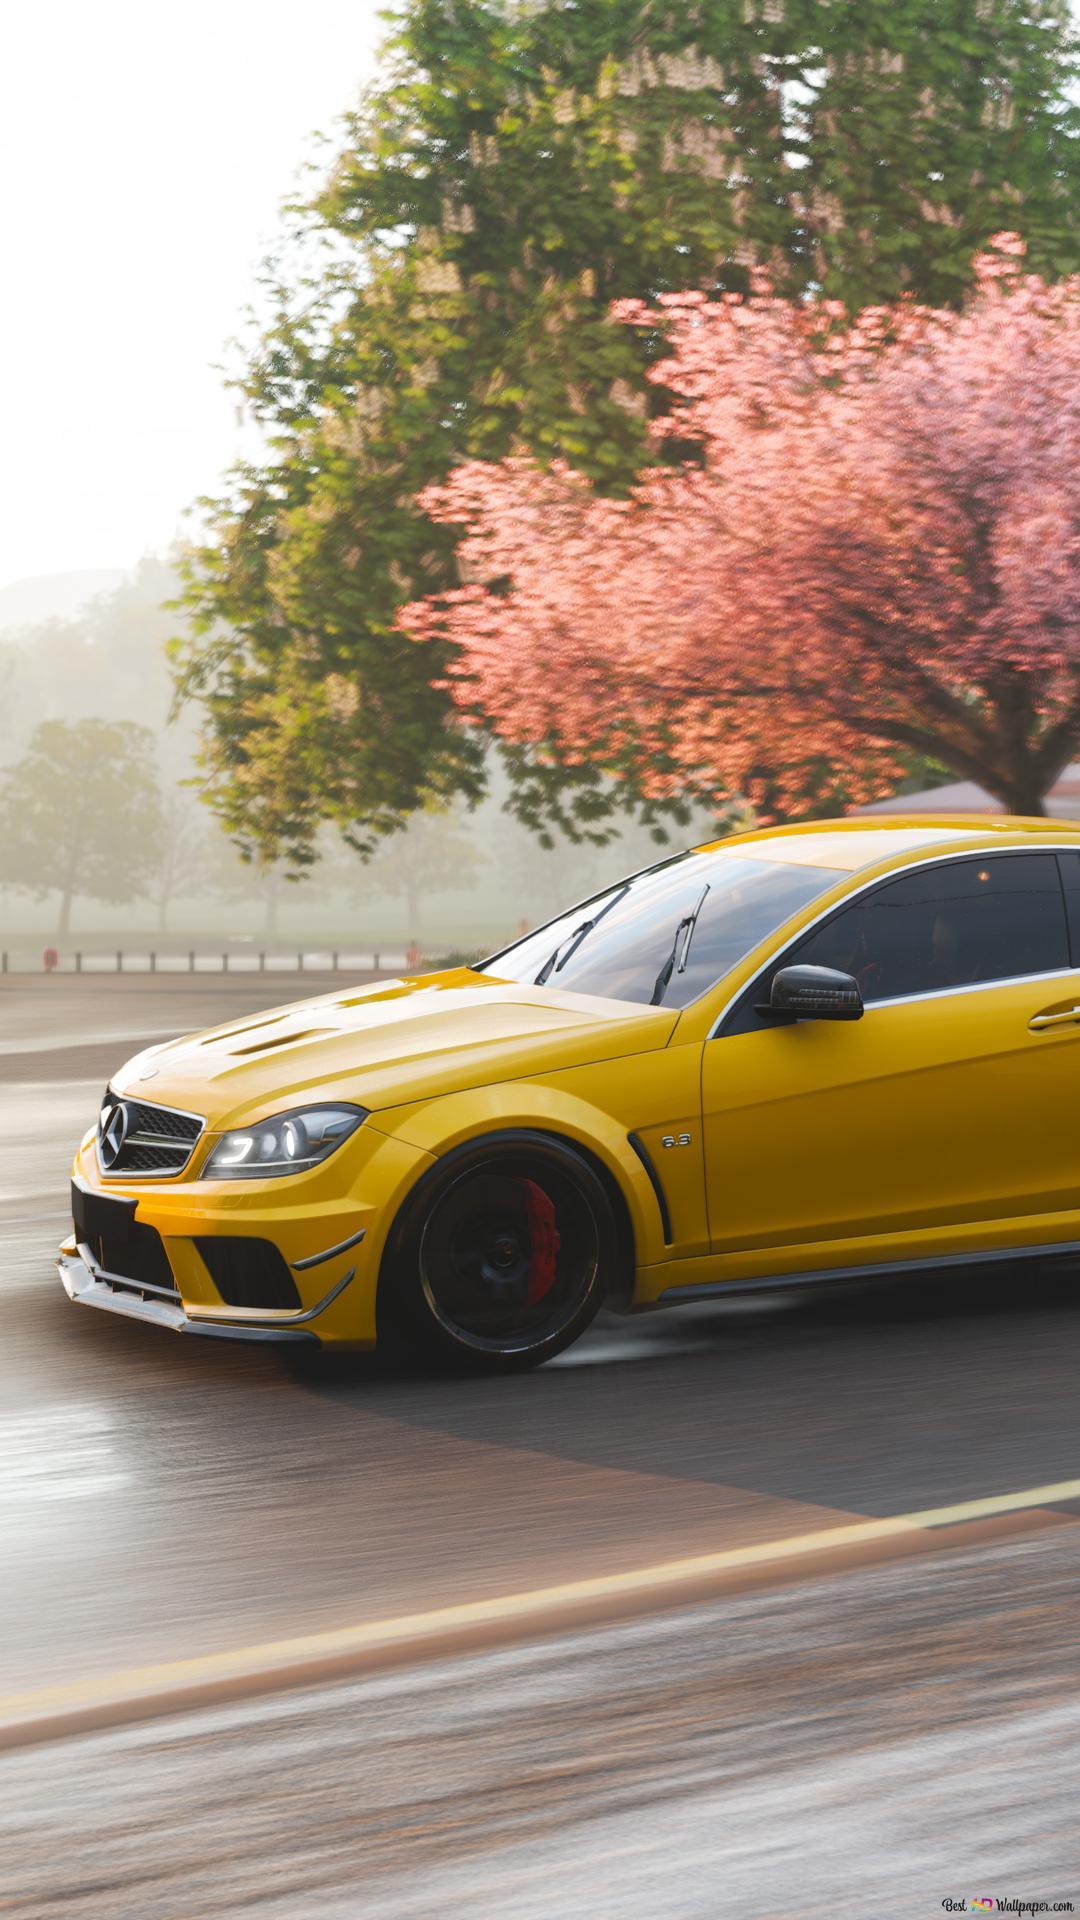 Forza Horizon 4 Rennspiel Mercedes Benz Amg C63 S Coupe Hd